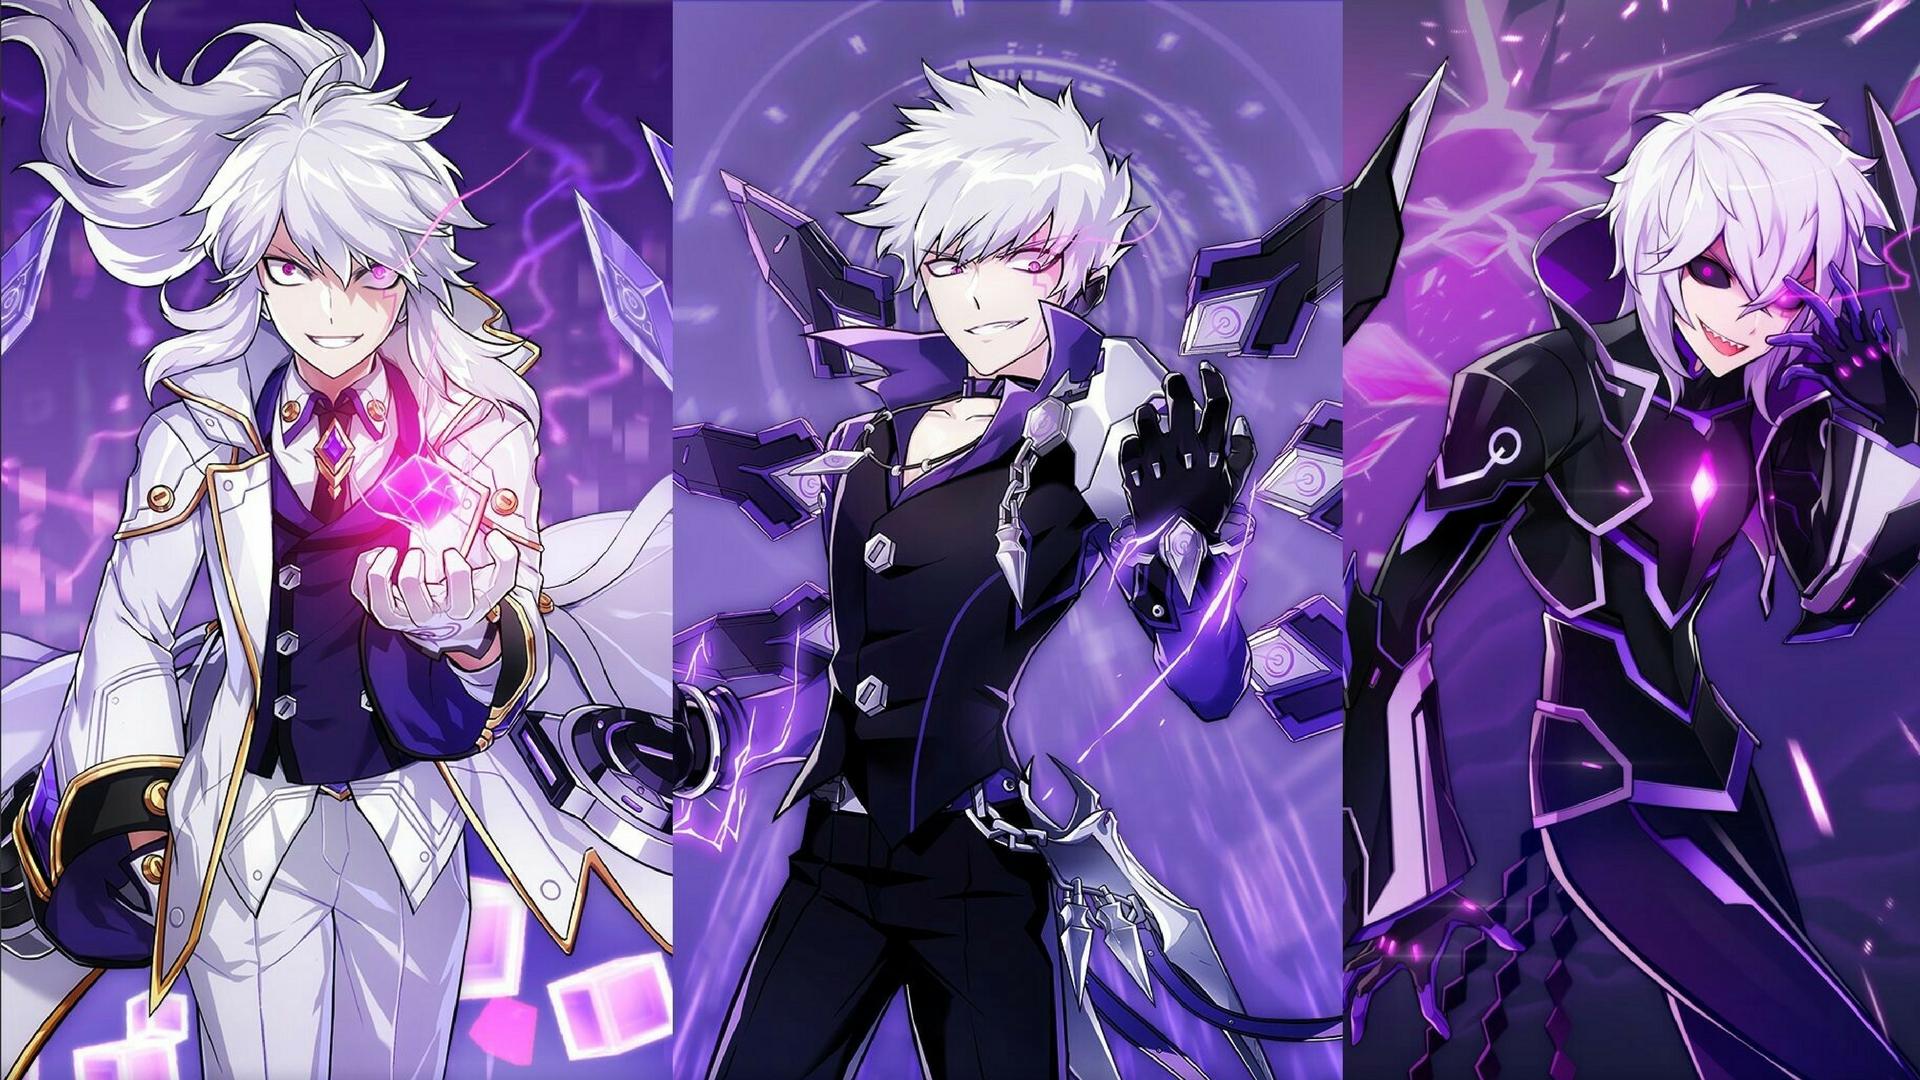 Papel de parede : Meninos anime, Anime Game, Elsword ...